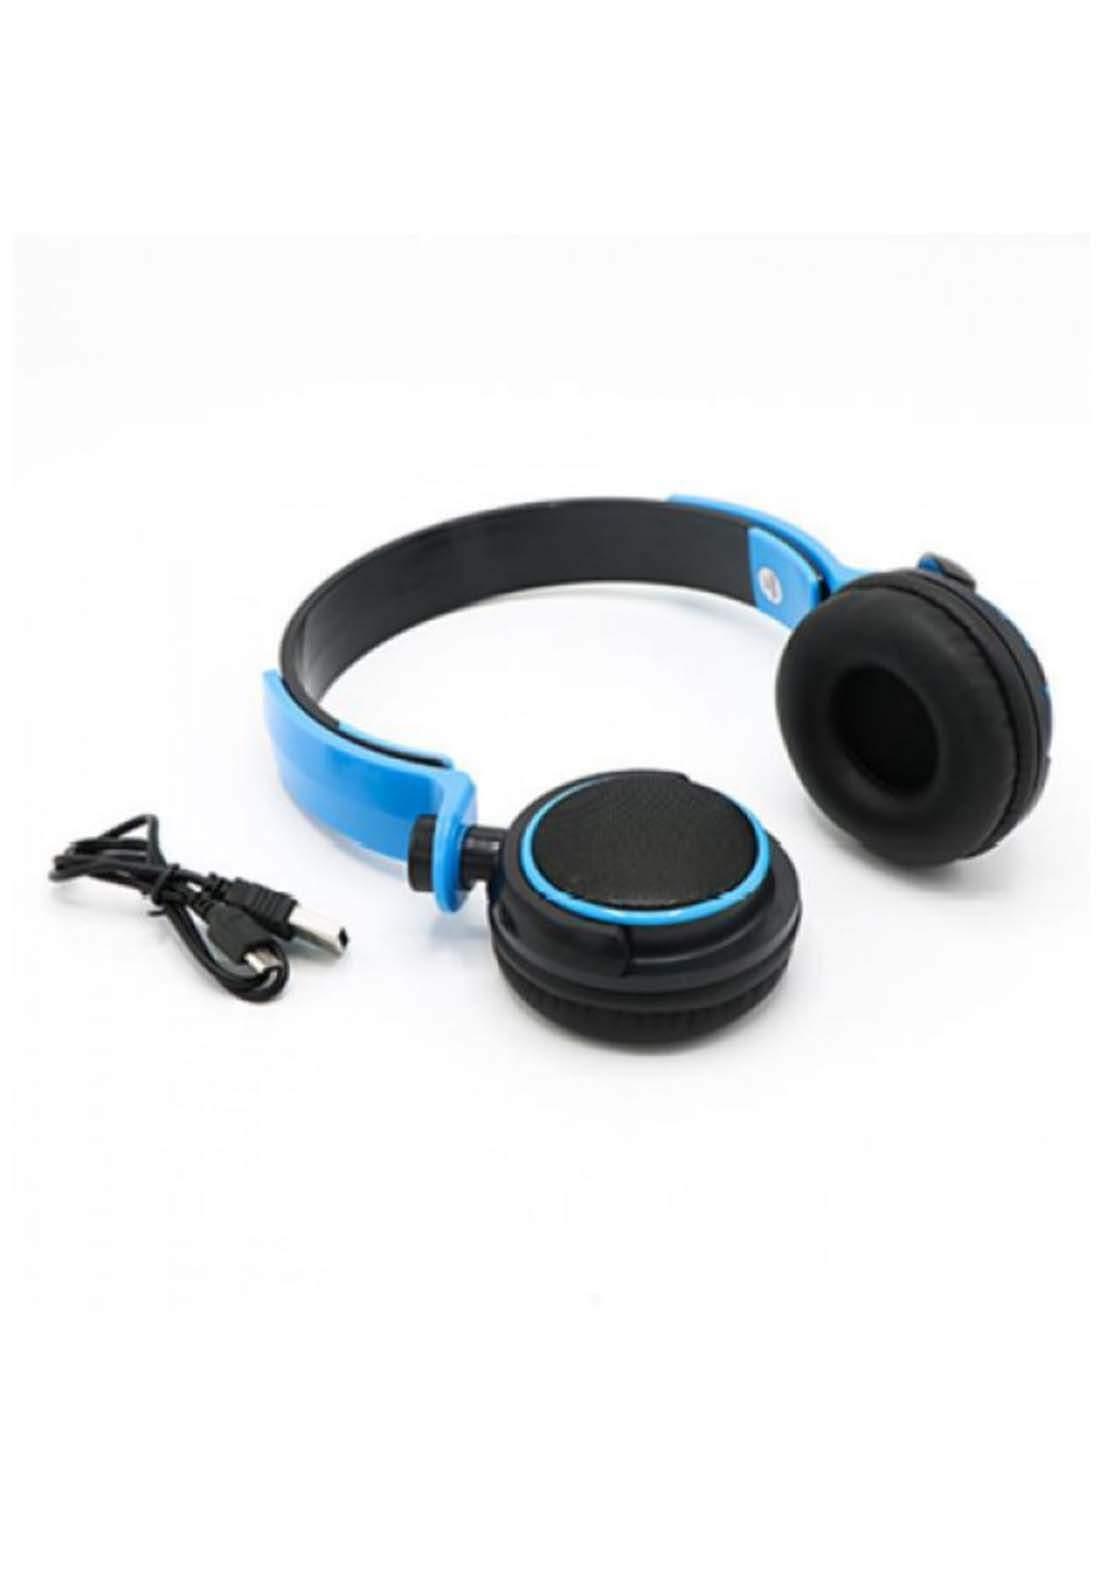 Havit bt-im8001 Headphone - Blue سماعة